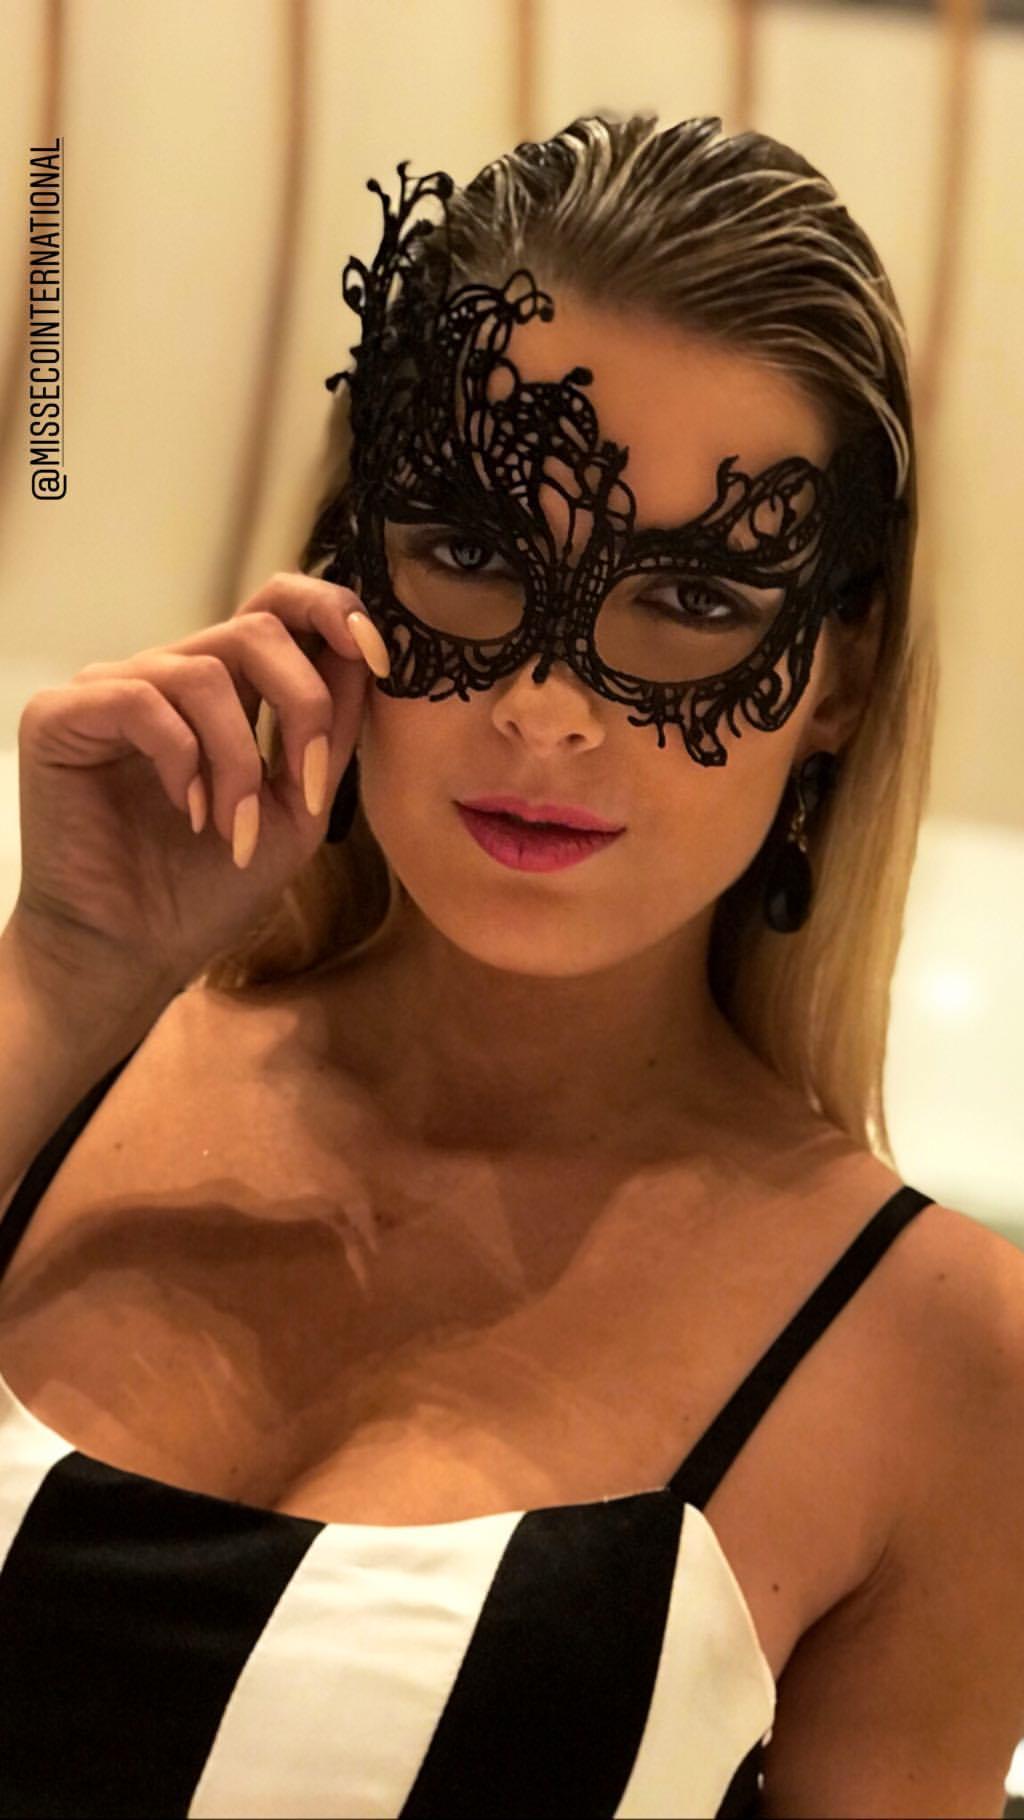 taina laydner, miss eco brasil 2019. - Página 4 52826911